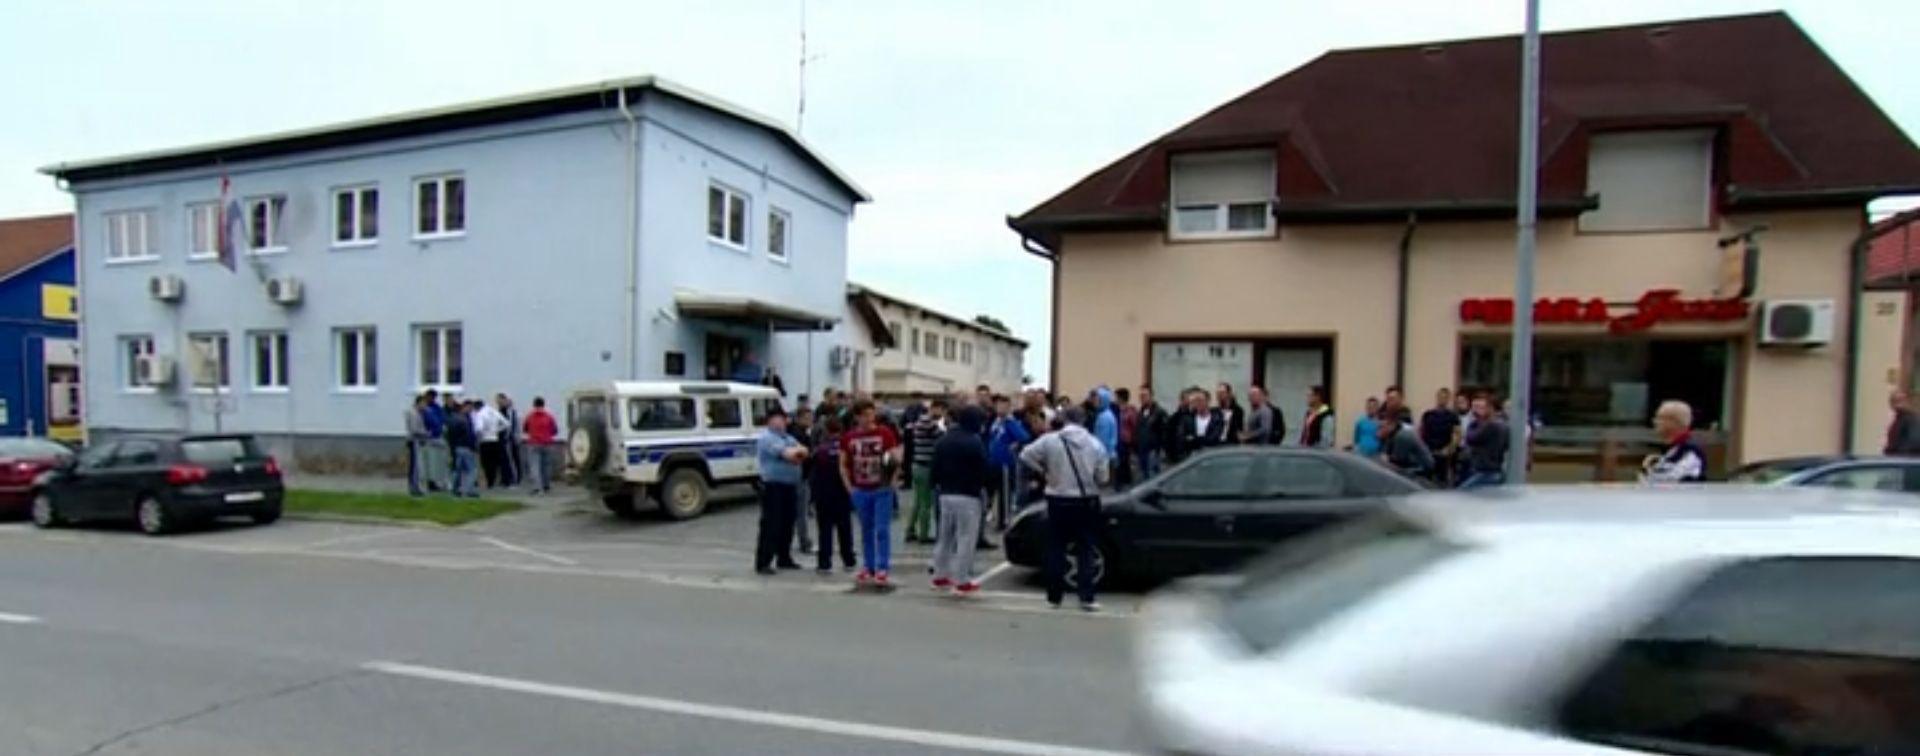 "PROSVJED GRAĐANA PRED POLICIJOM U SLATINI ""Povod napada je mržnja, mi smo za njih Šiptari s Kosova"""